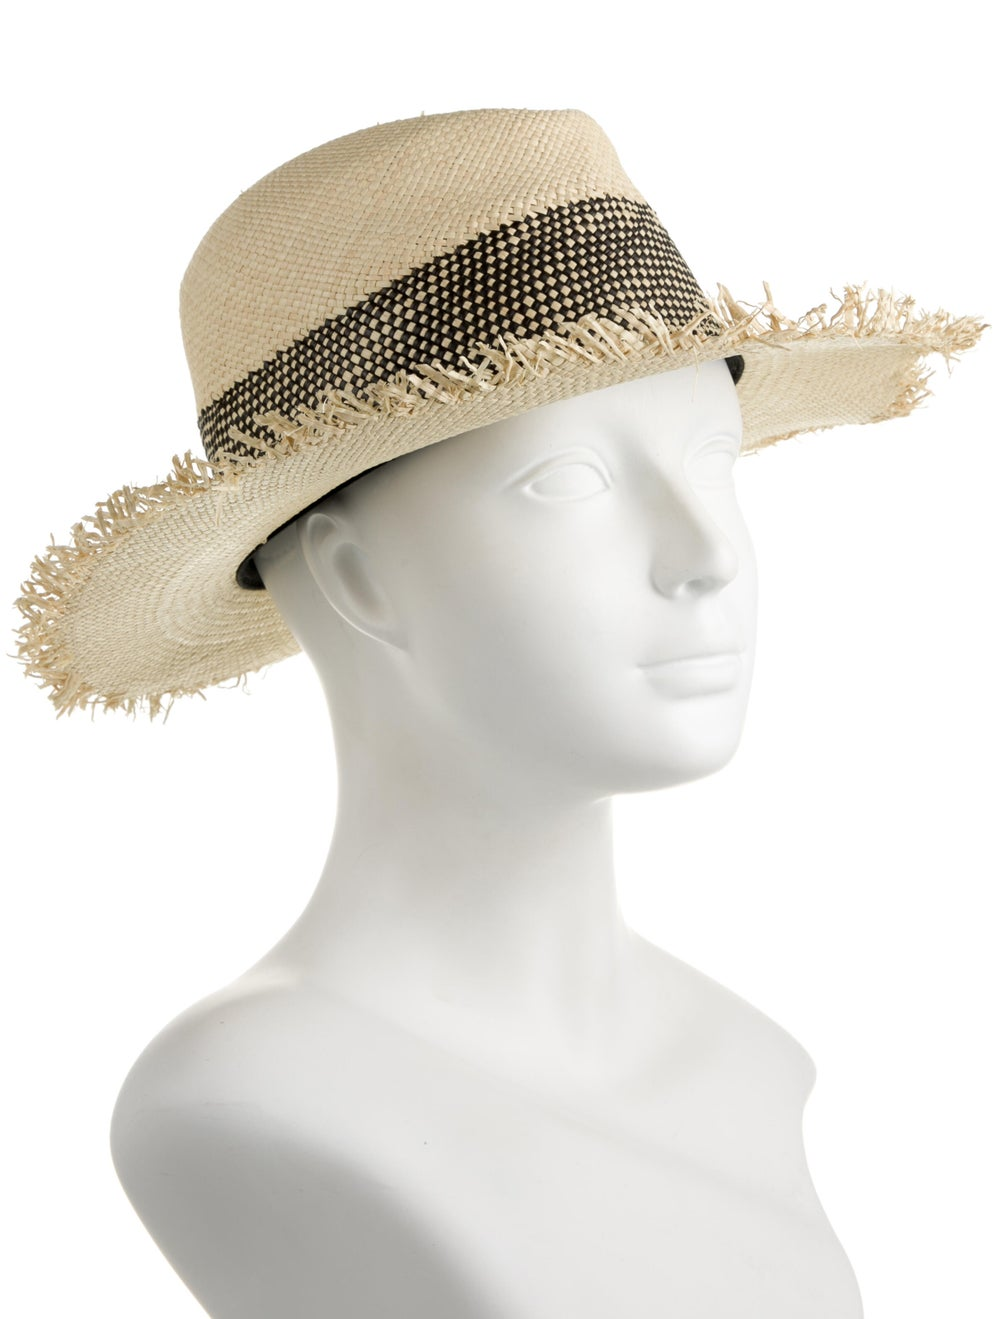 Rag & Bone Straw Wide Brim Hat - image 3